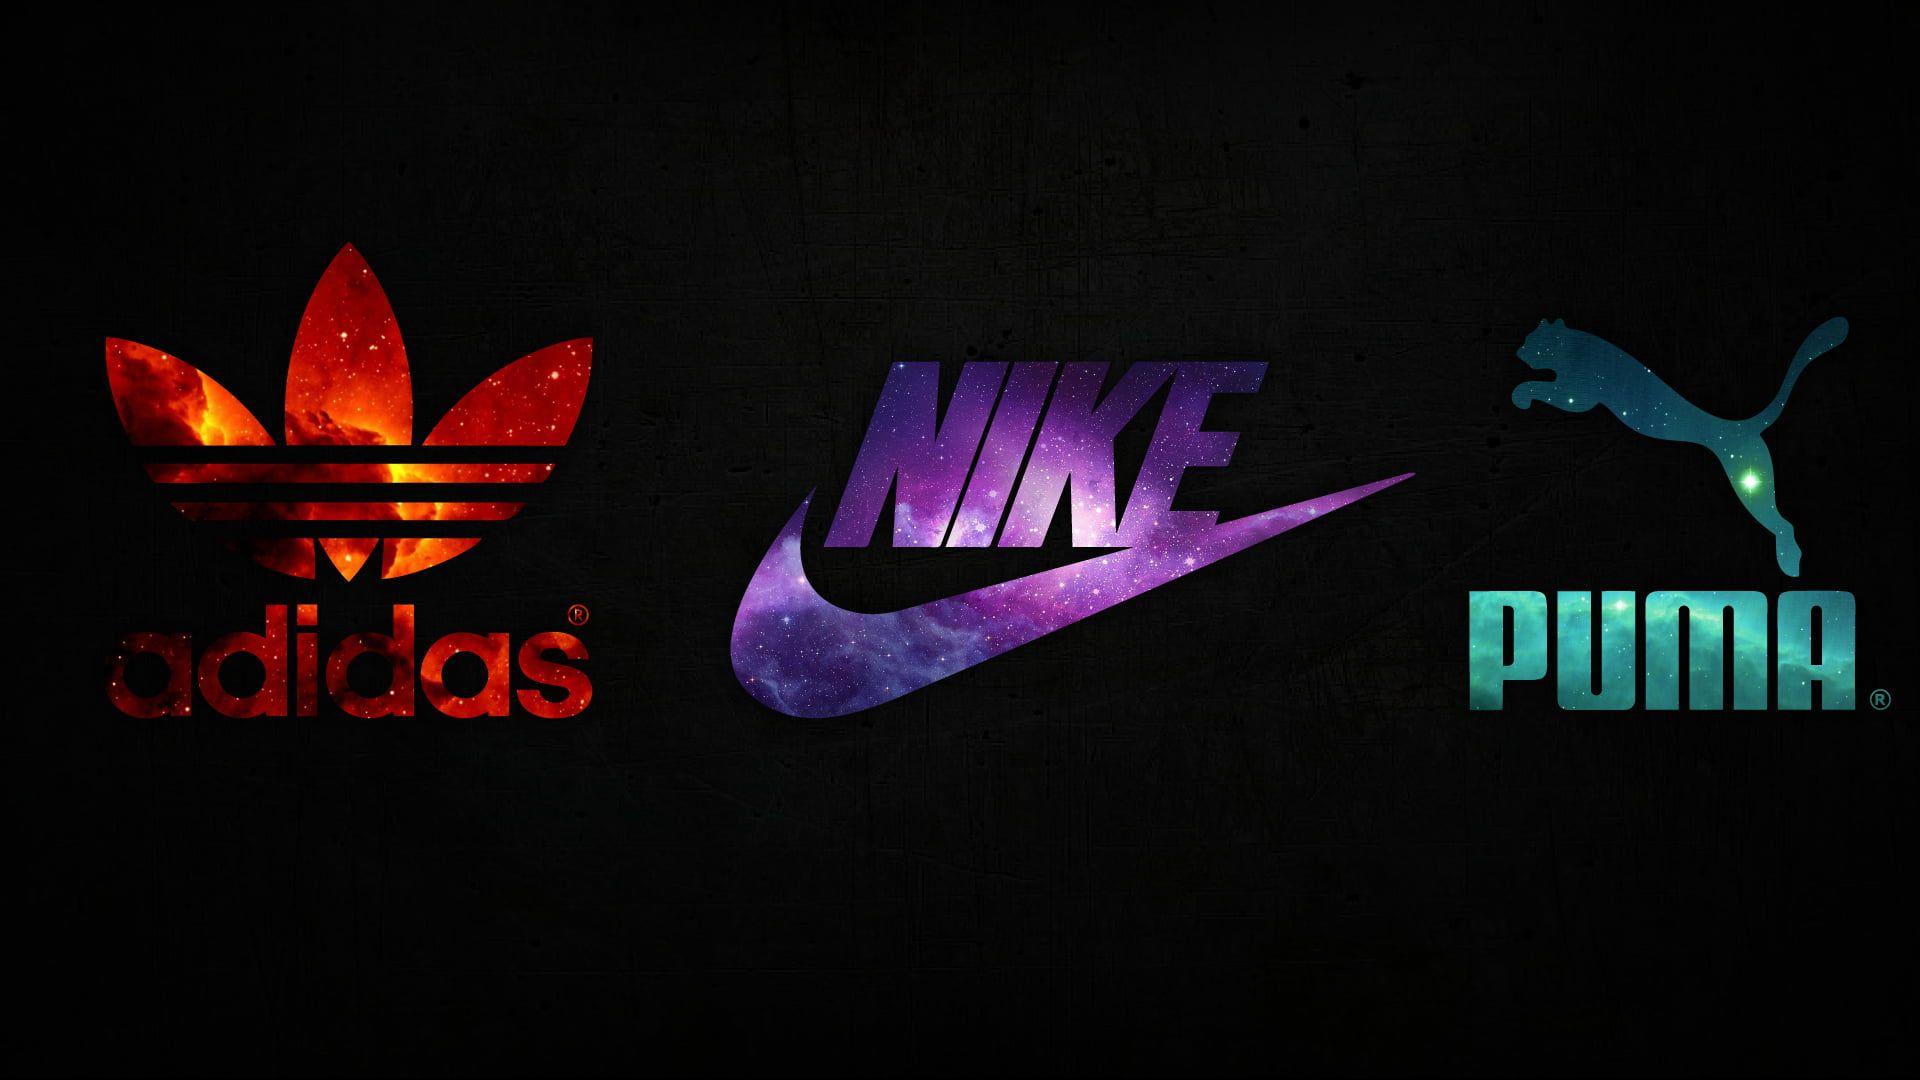 Nike Adidas Puma space logo 1080P wallpaper